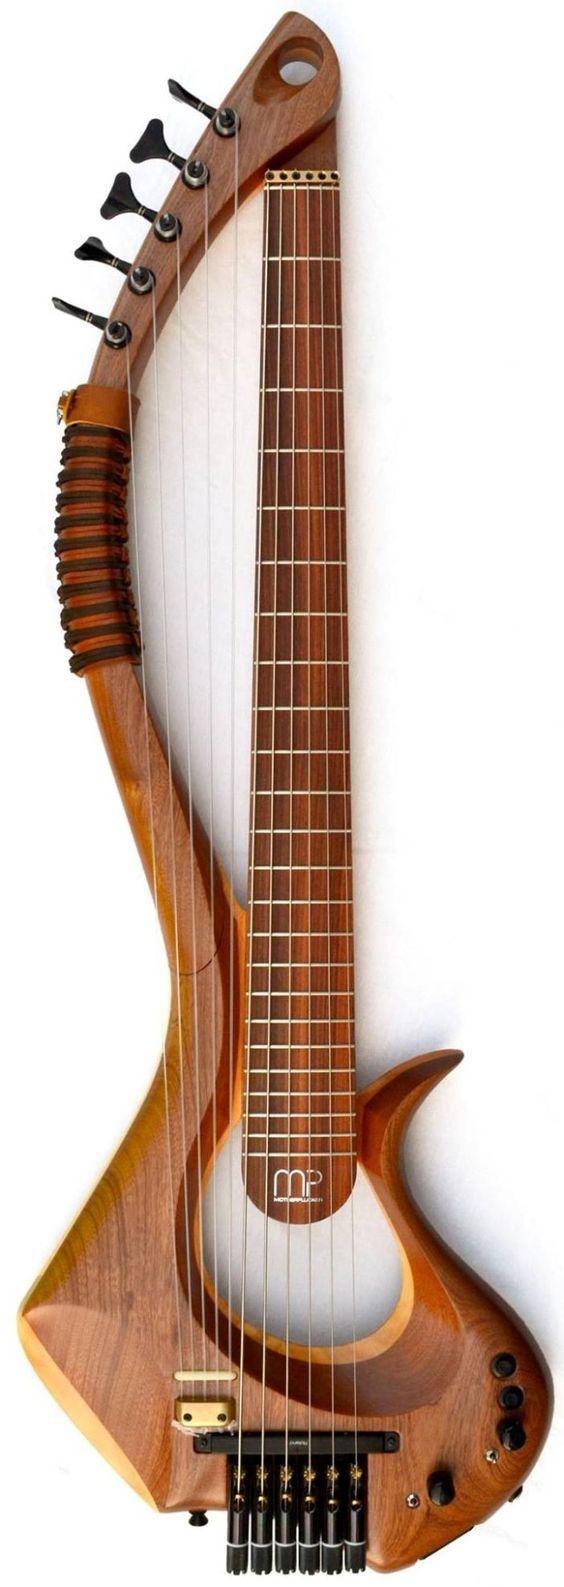 mother plucker guitars boudica 6 string bass harp guitar     pinterest com